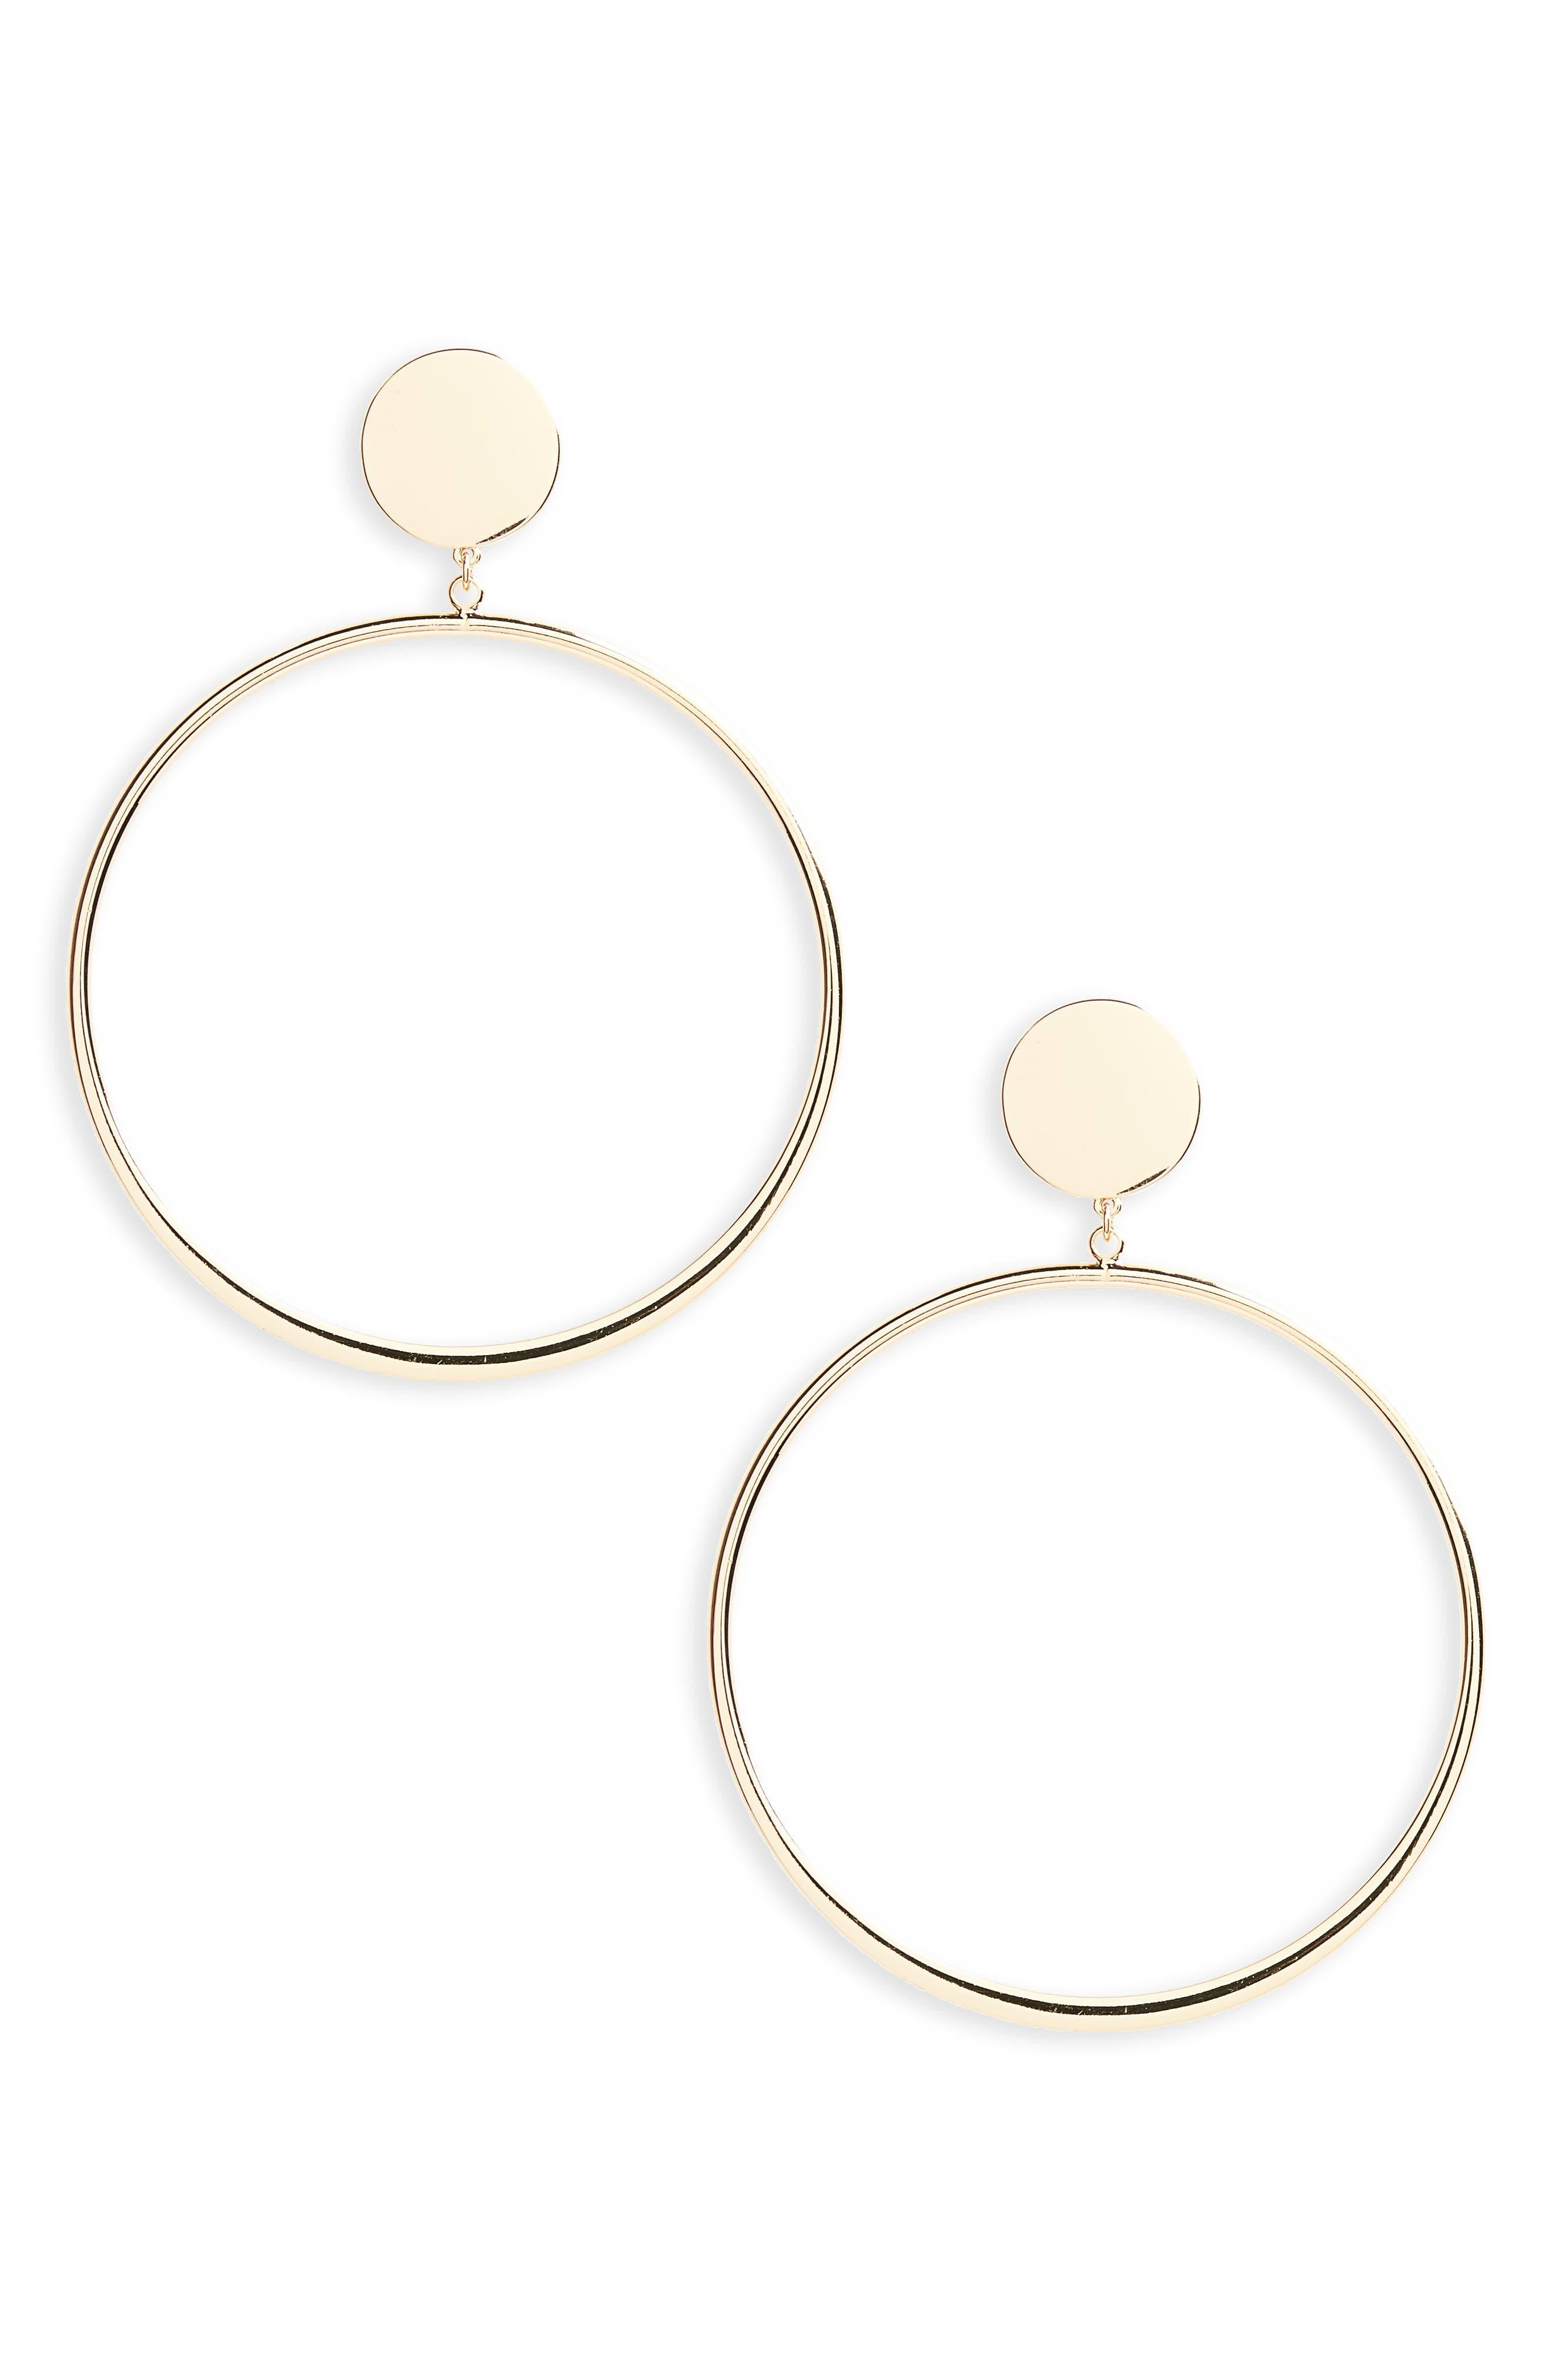 Main Image - Canvas Jewelry Circle Hoop Earrings